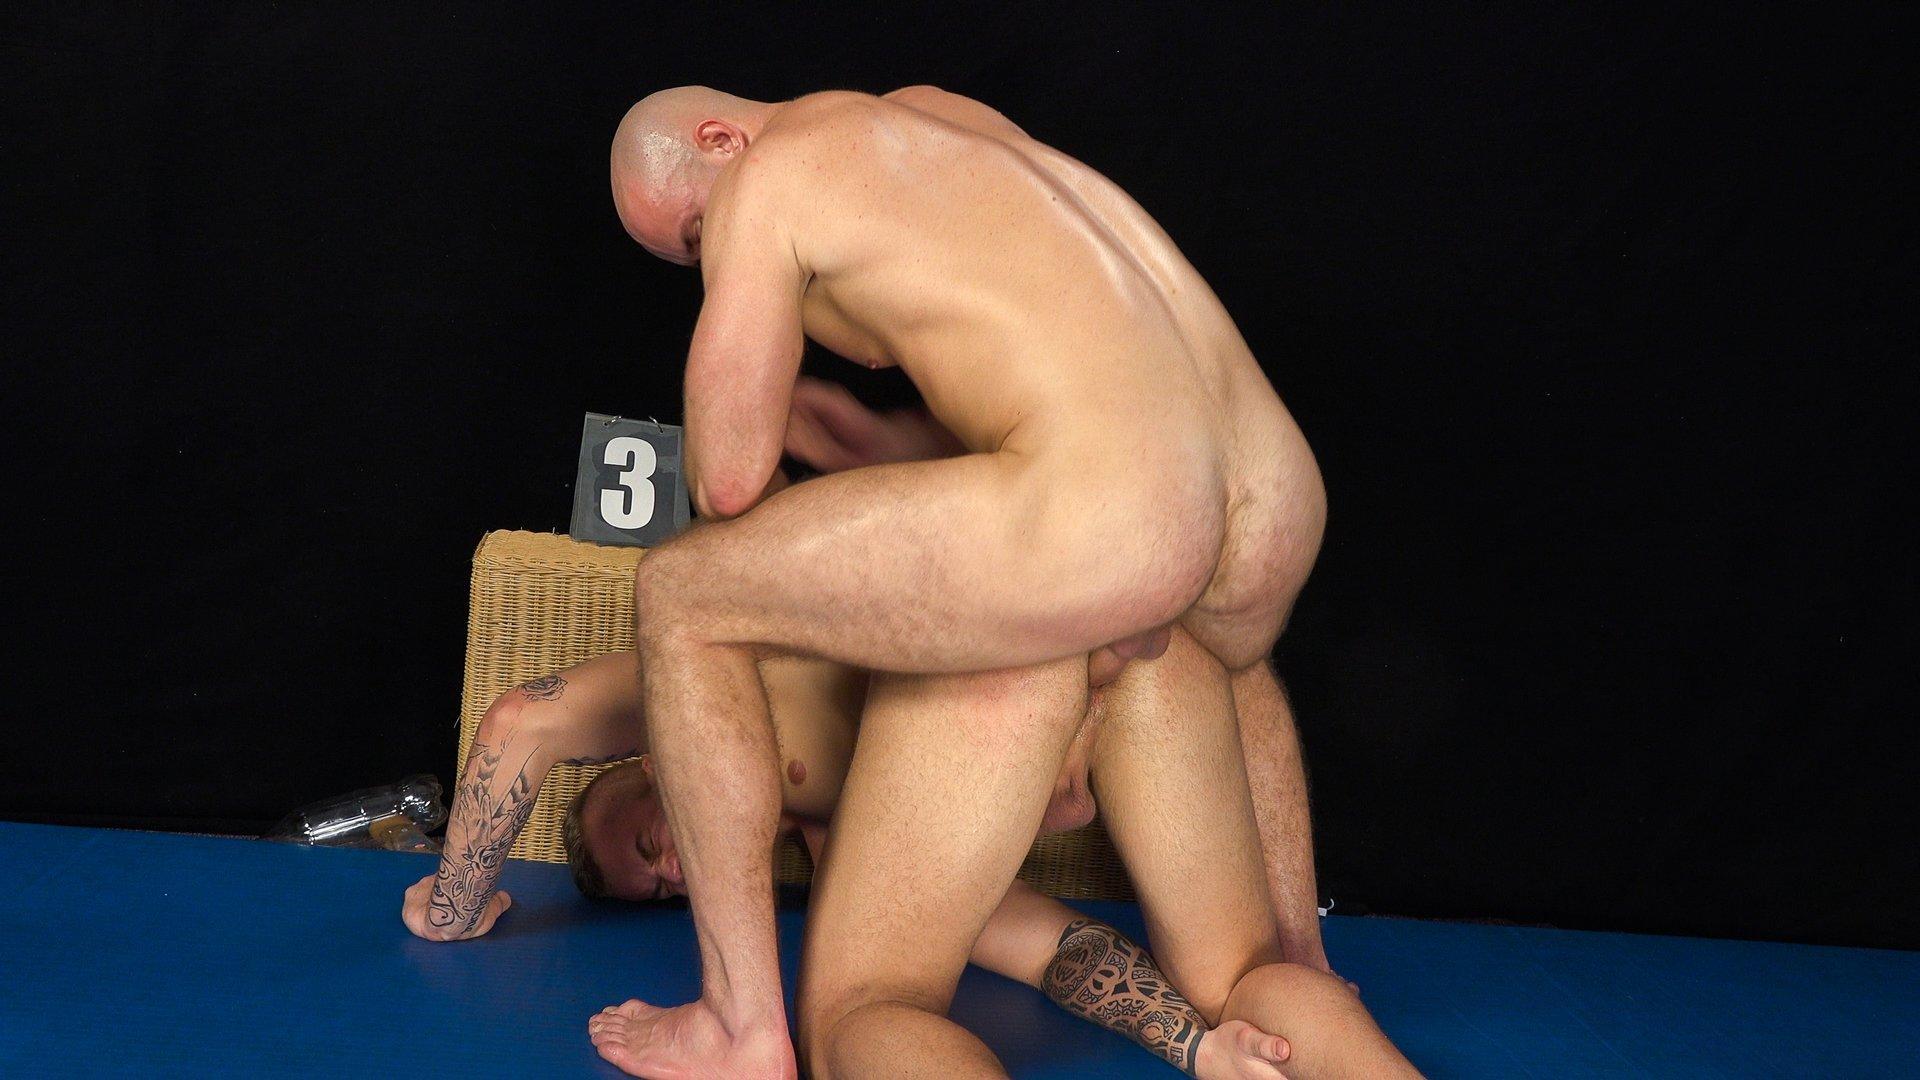 Photo number 13 from Jindra vs Marek - WRESTLING shot for swnude on Kink.com. Featuring Jindra Durak and Marek Borek in hardcore BDSM & Fetish porn.